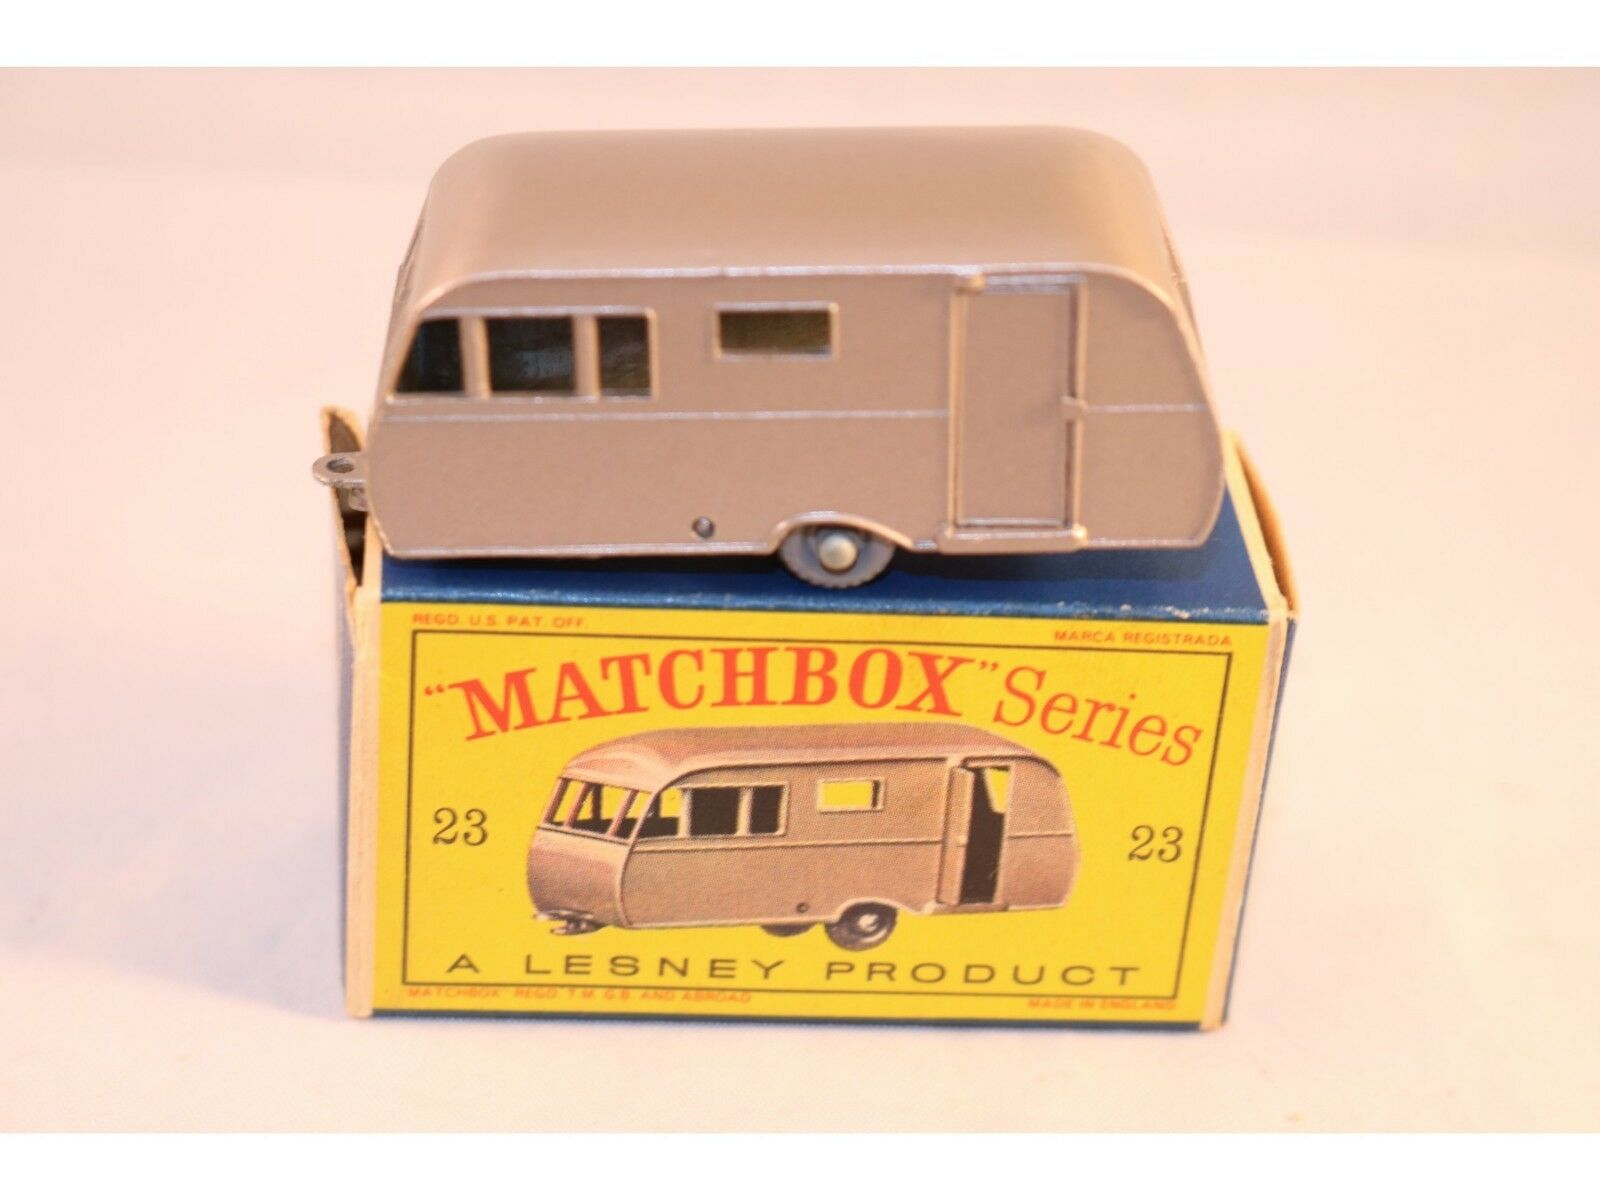 Matchbox Lesney 23 Caravan trailer bronze GPW 99% mint in box a beauty